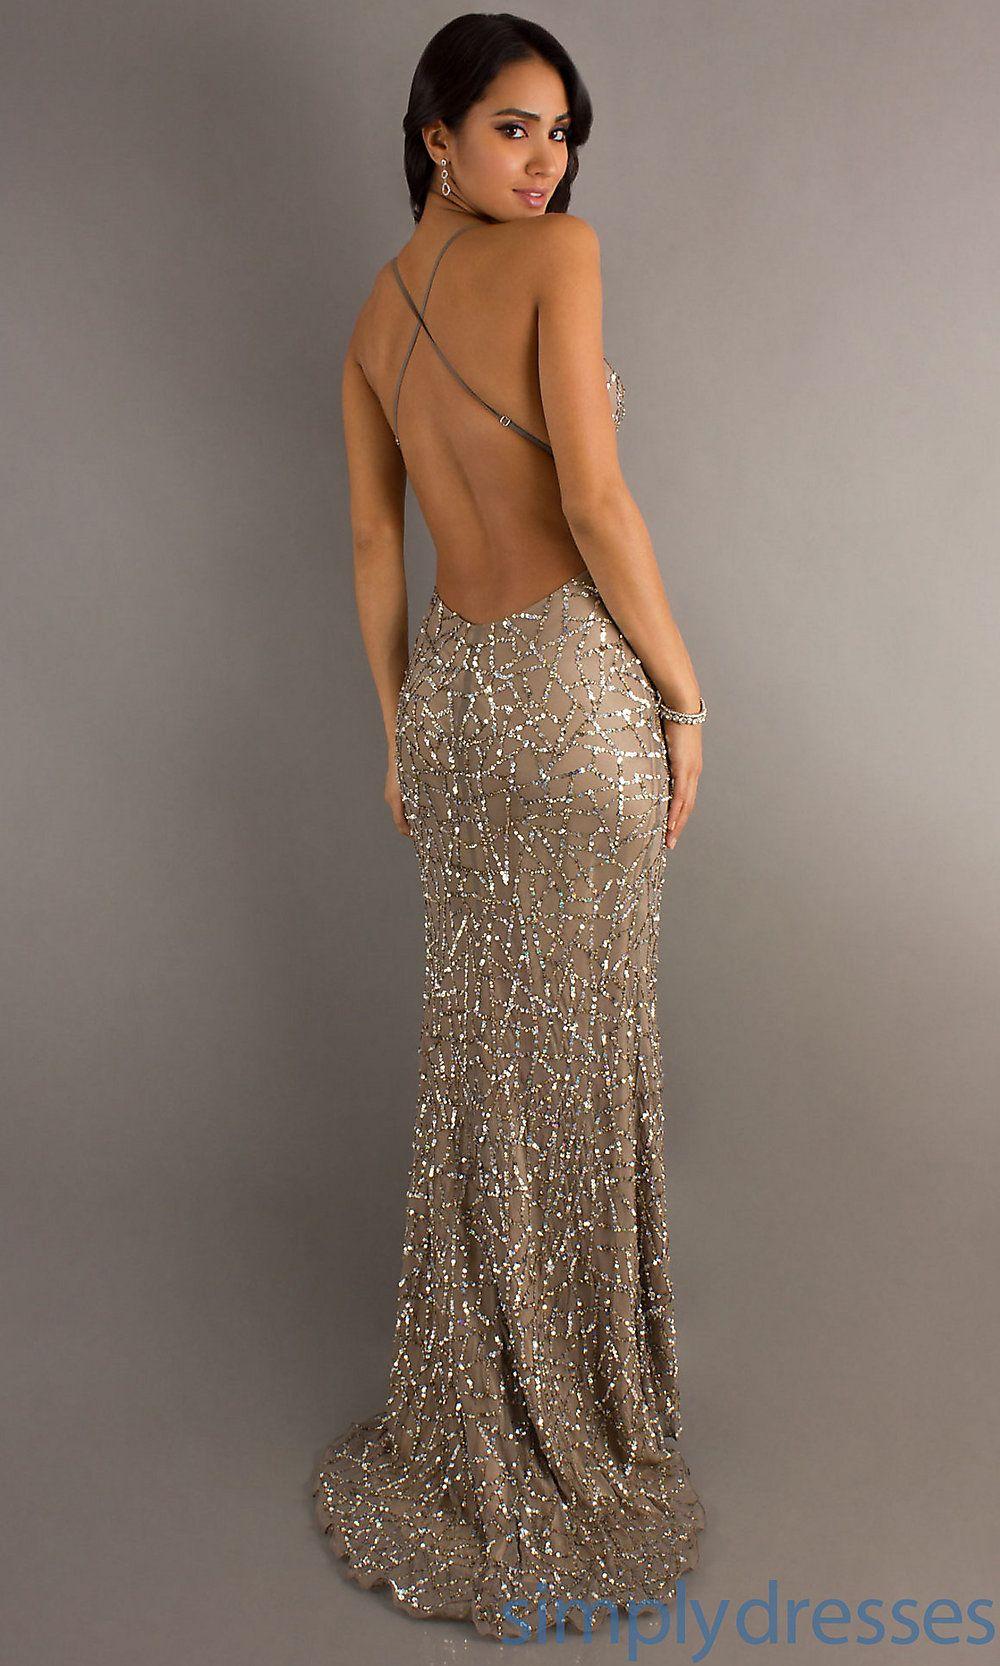 View dress detail scala formal wear pinterest prom